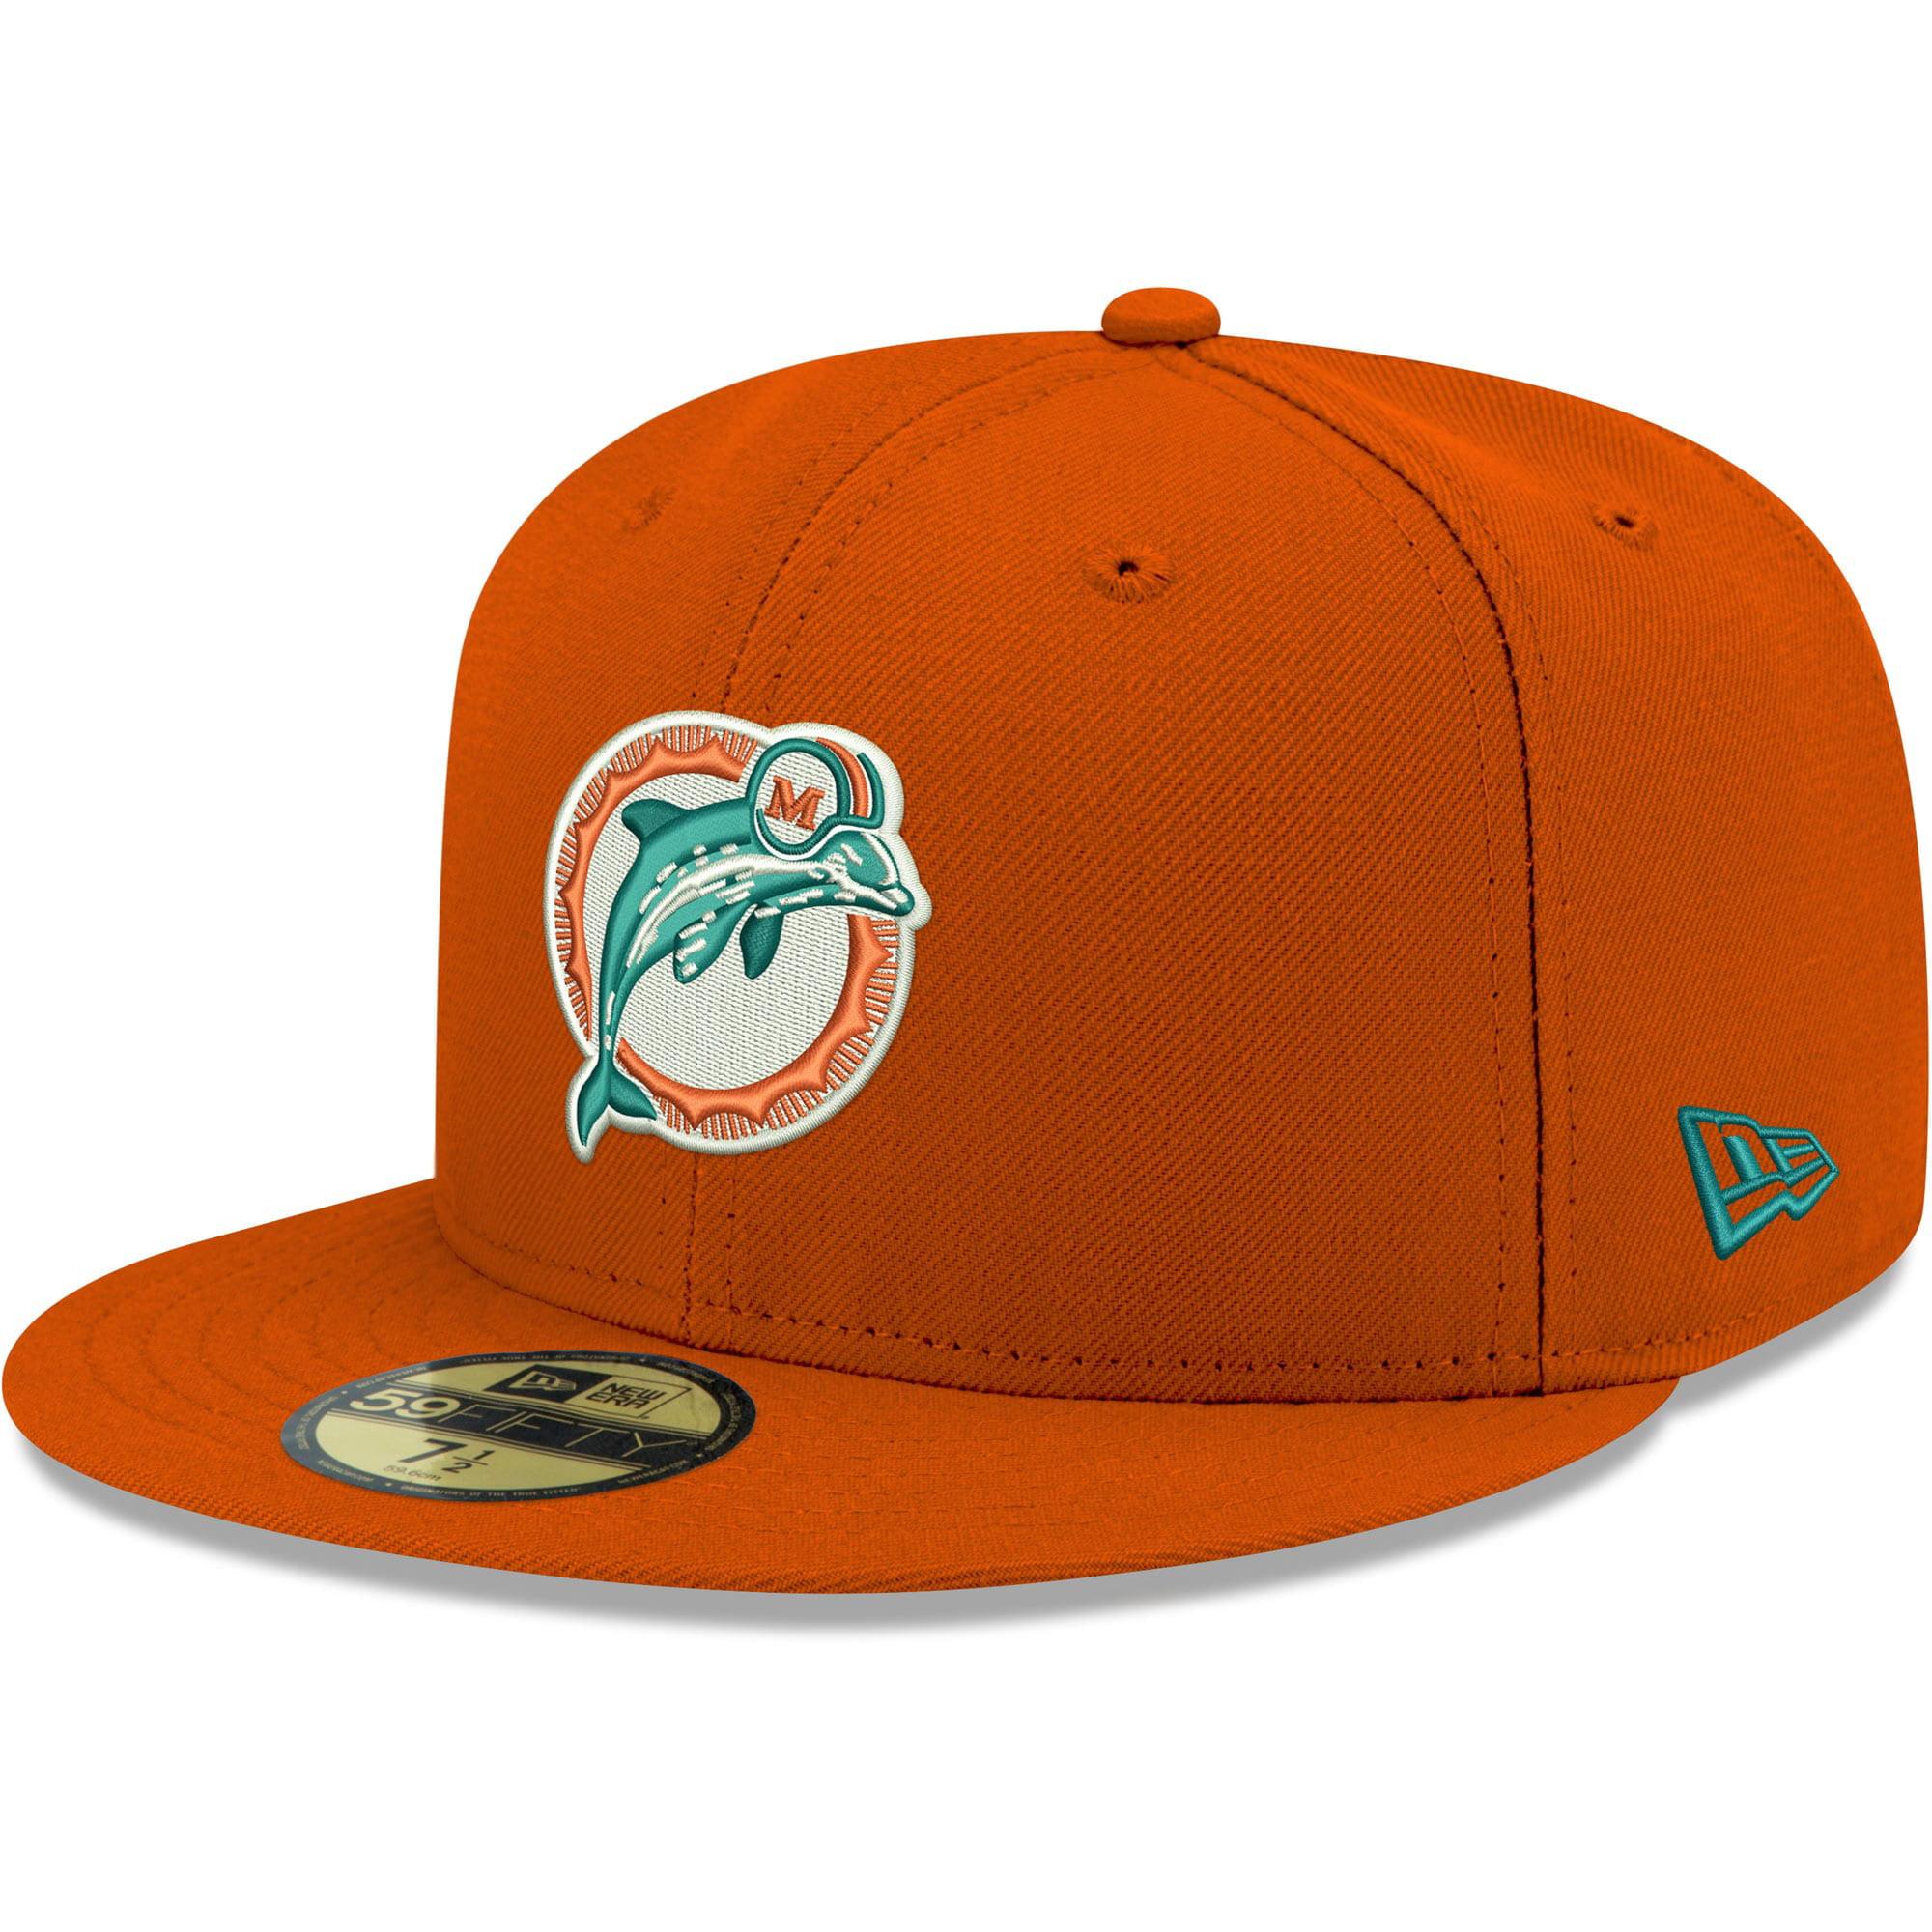 Miami Dolphins New Era Omaha Throwback 59fifty Fitted Hat Orange Walmart Com Walmart Com